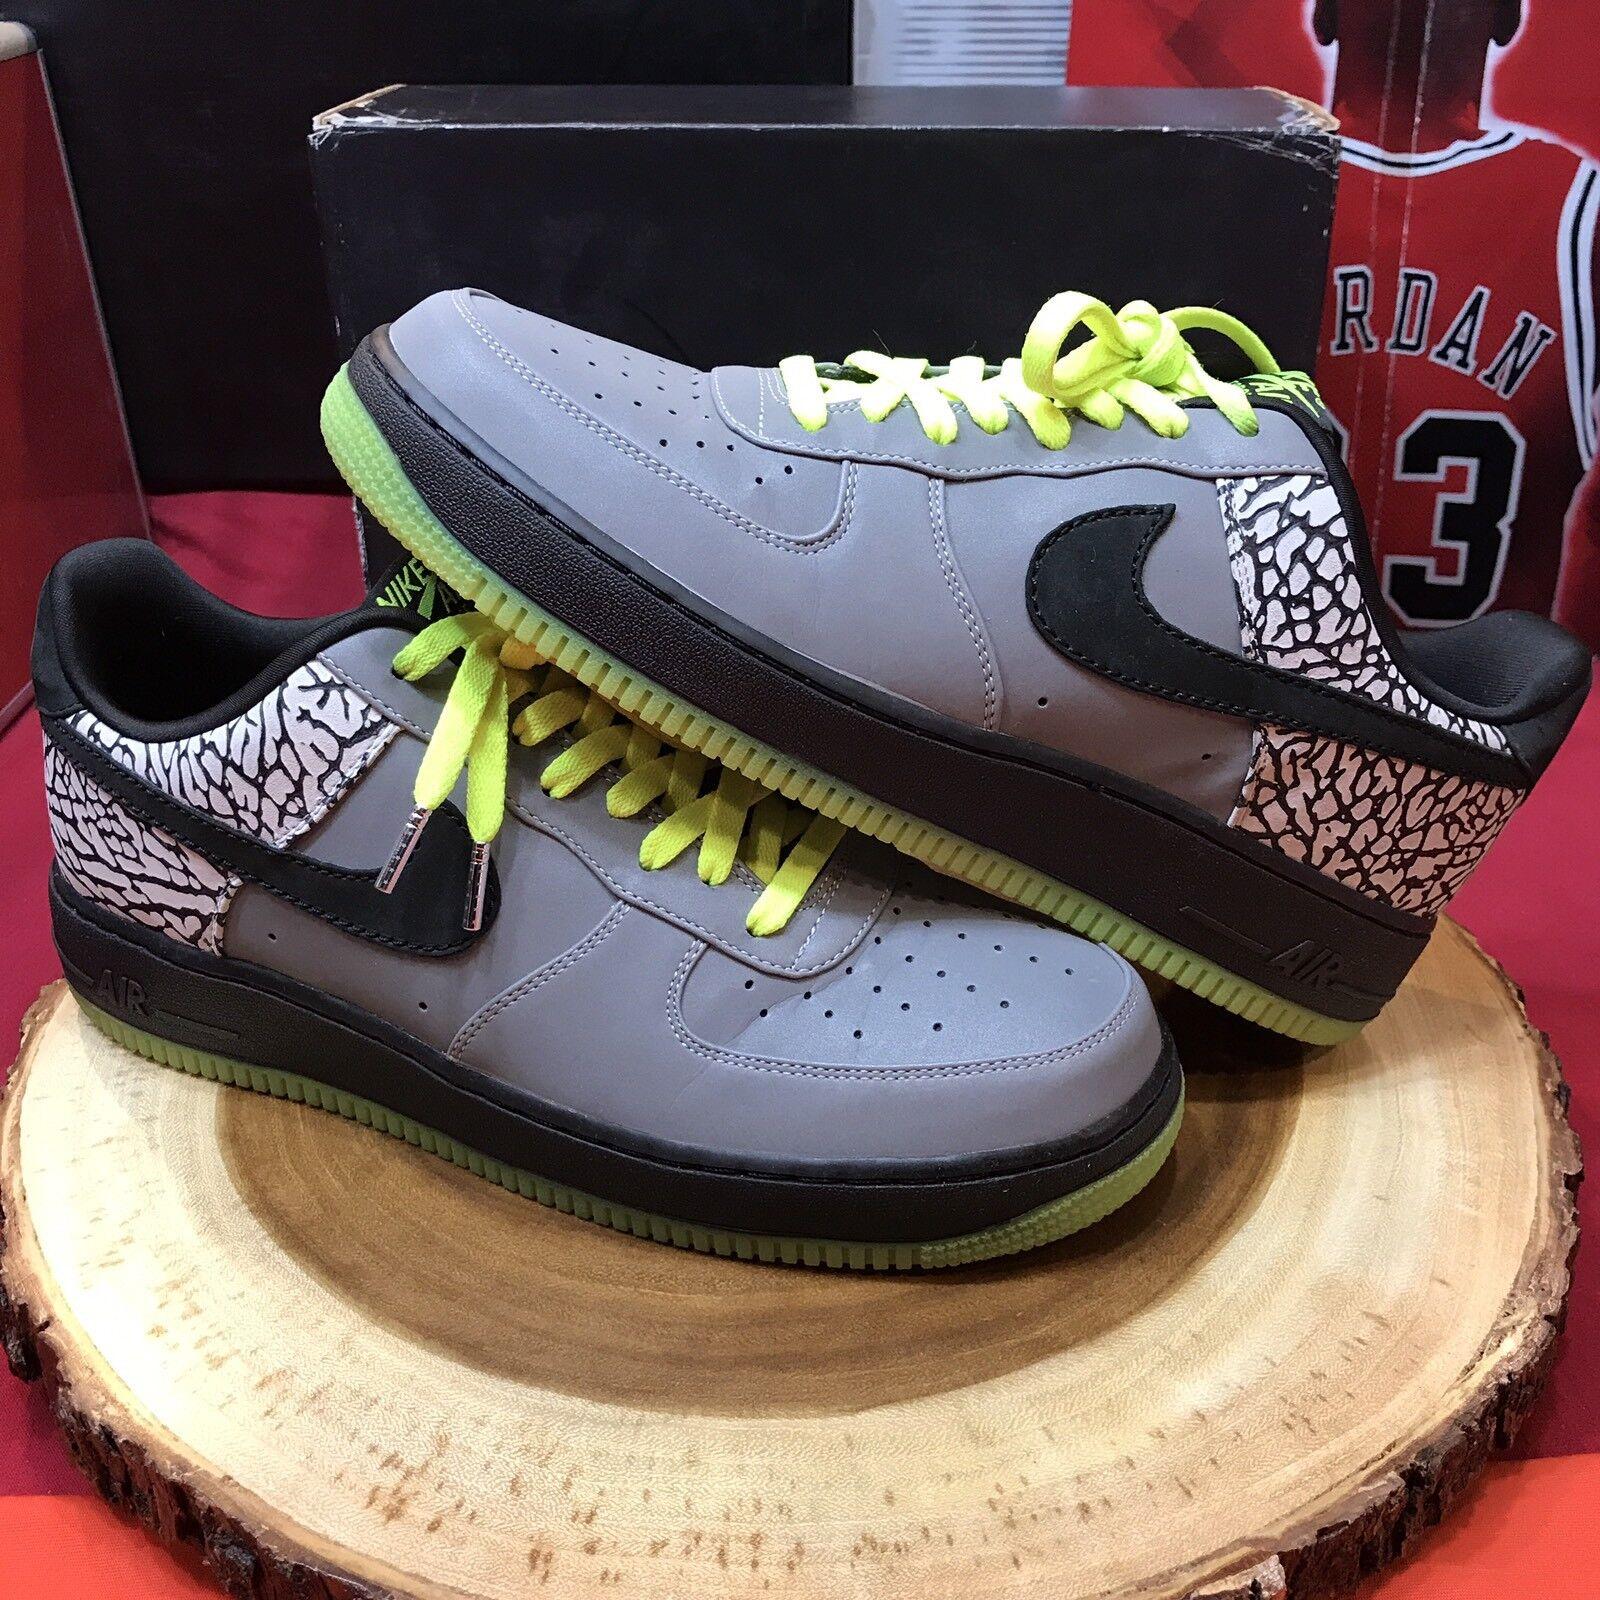 Nike Air Force One Premium bajo DJ Clark Kent Kent Clark cemento negro 329423 001 Jordania 10,5 comodo y atractivo 3eb29f